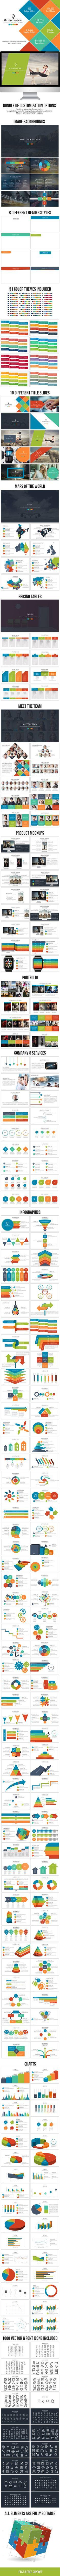 Business Ideas - Multipurpose PowerPoint Template - Business PowerPoint Templates